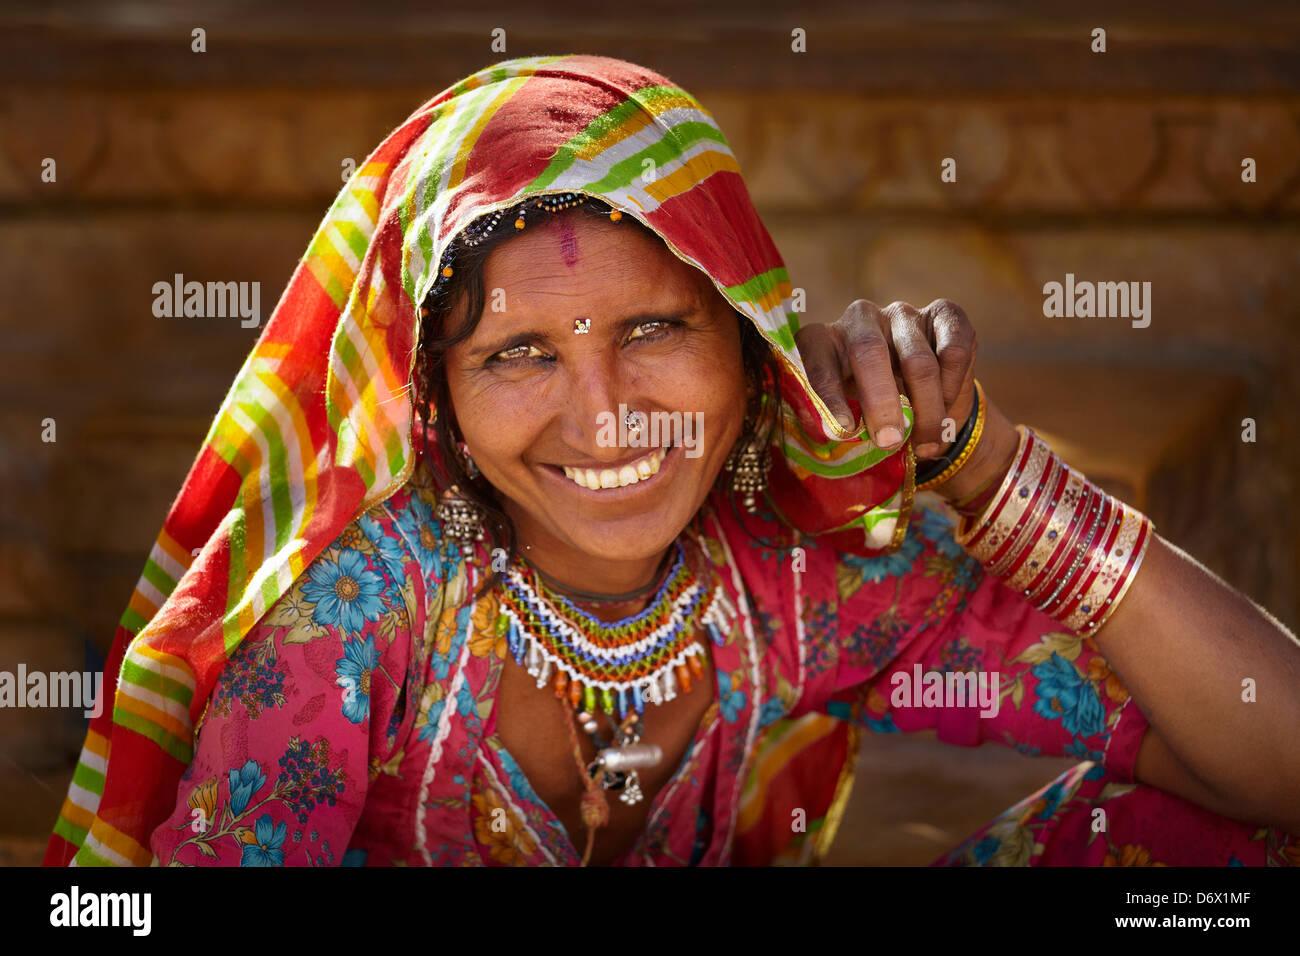 Portrait of smiling woman l'Inde, Jaisalmer, Rajasthan, India Photo Stock